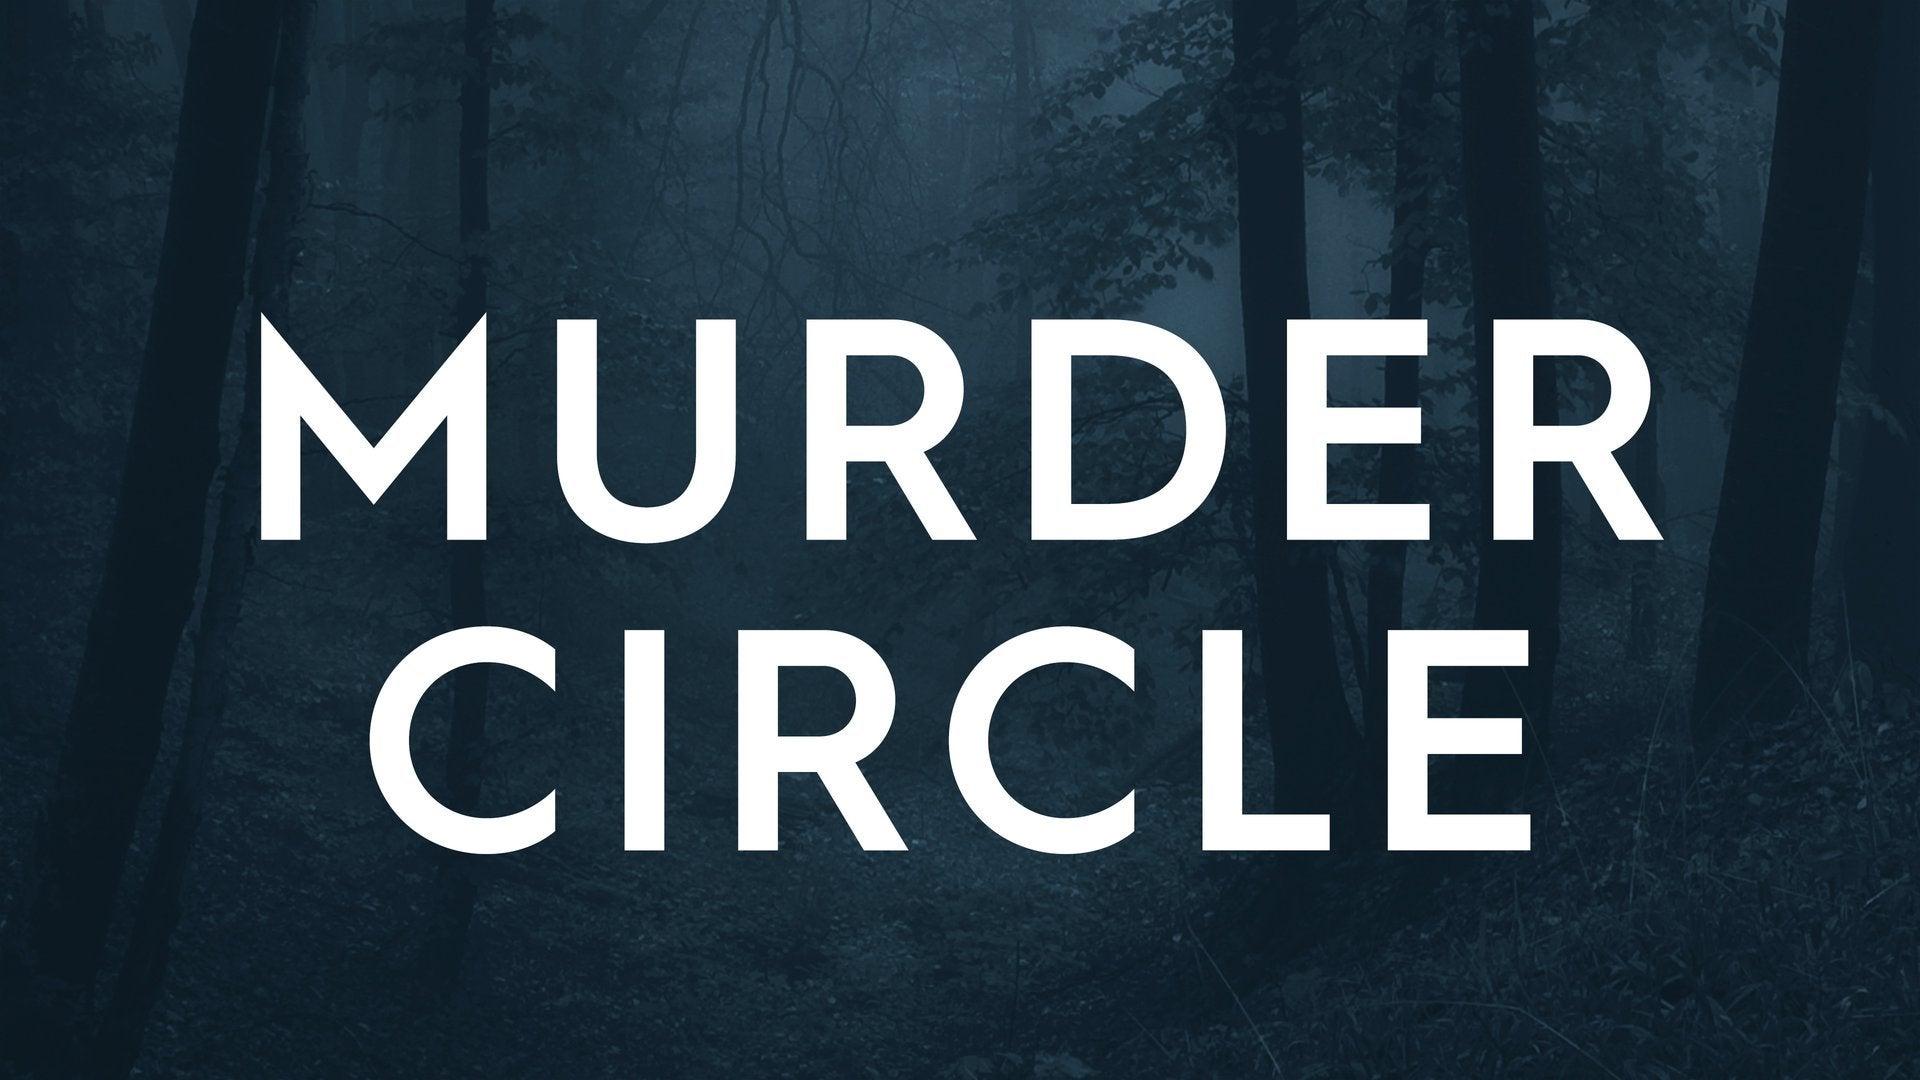 Murder Circle